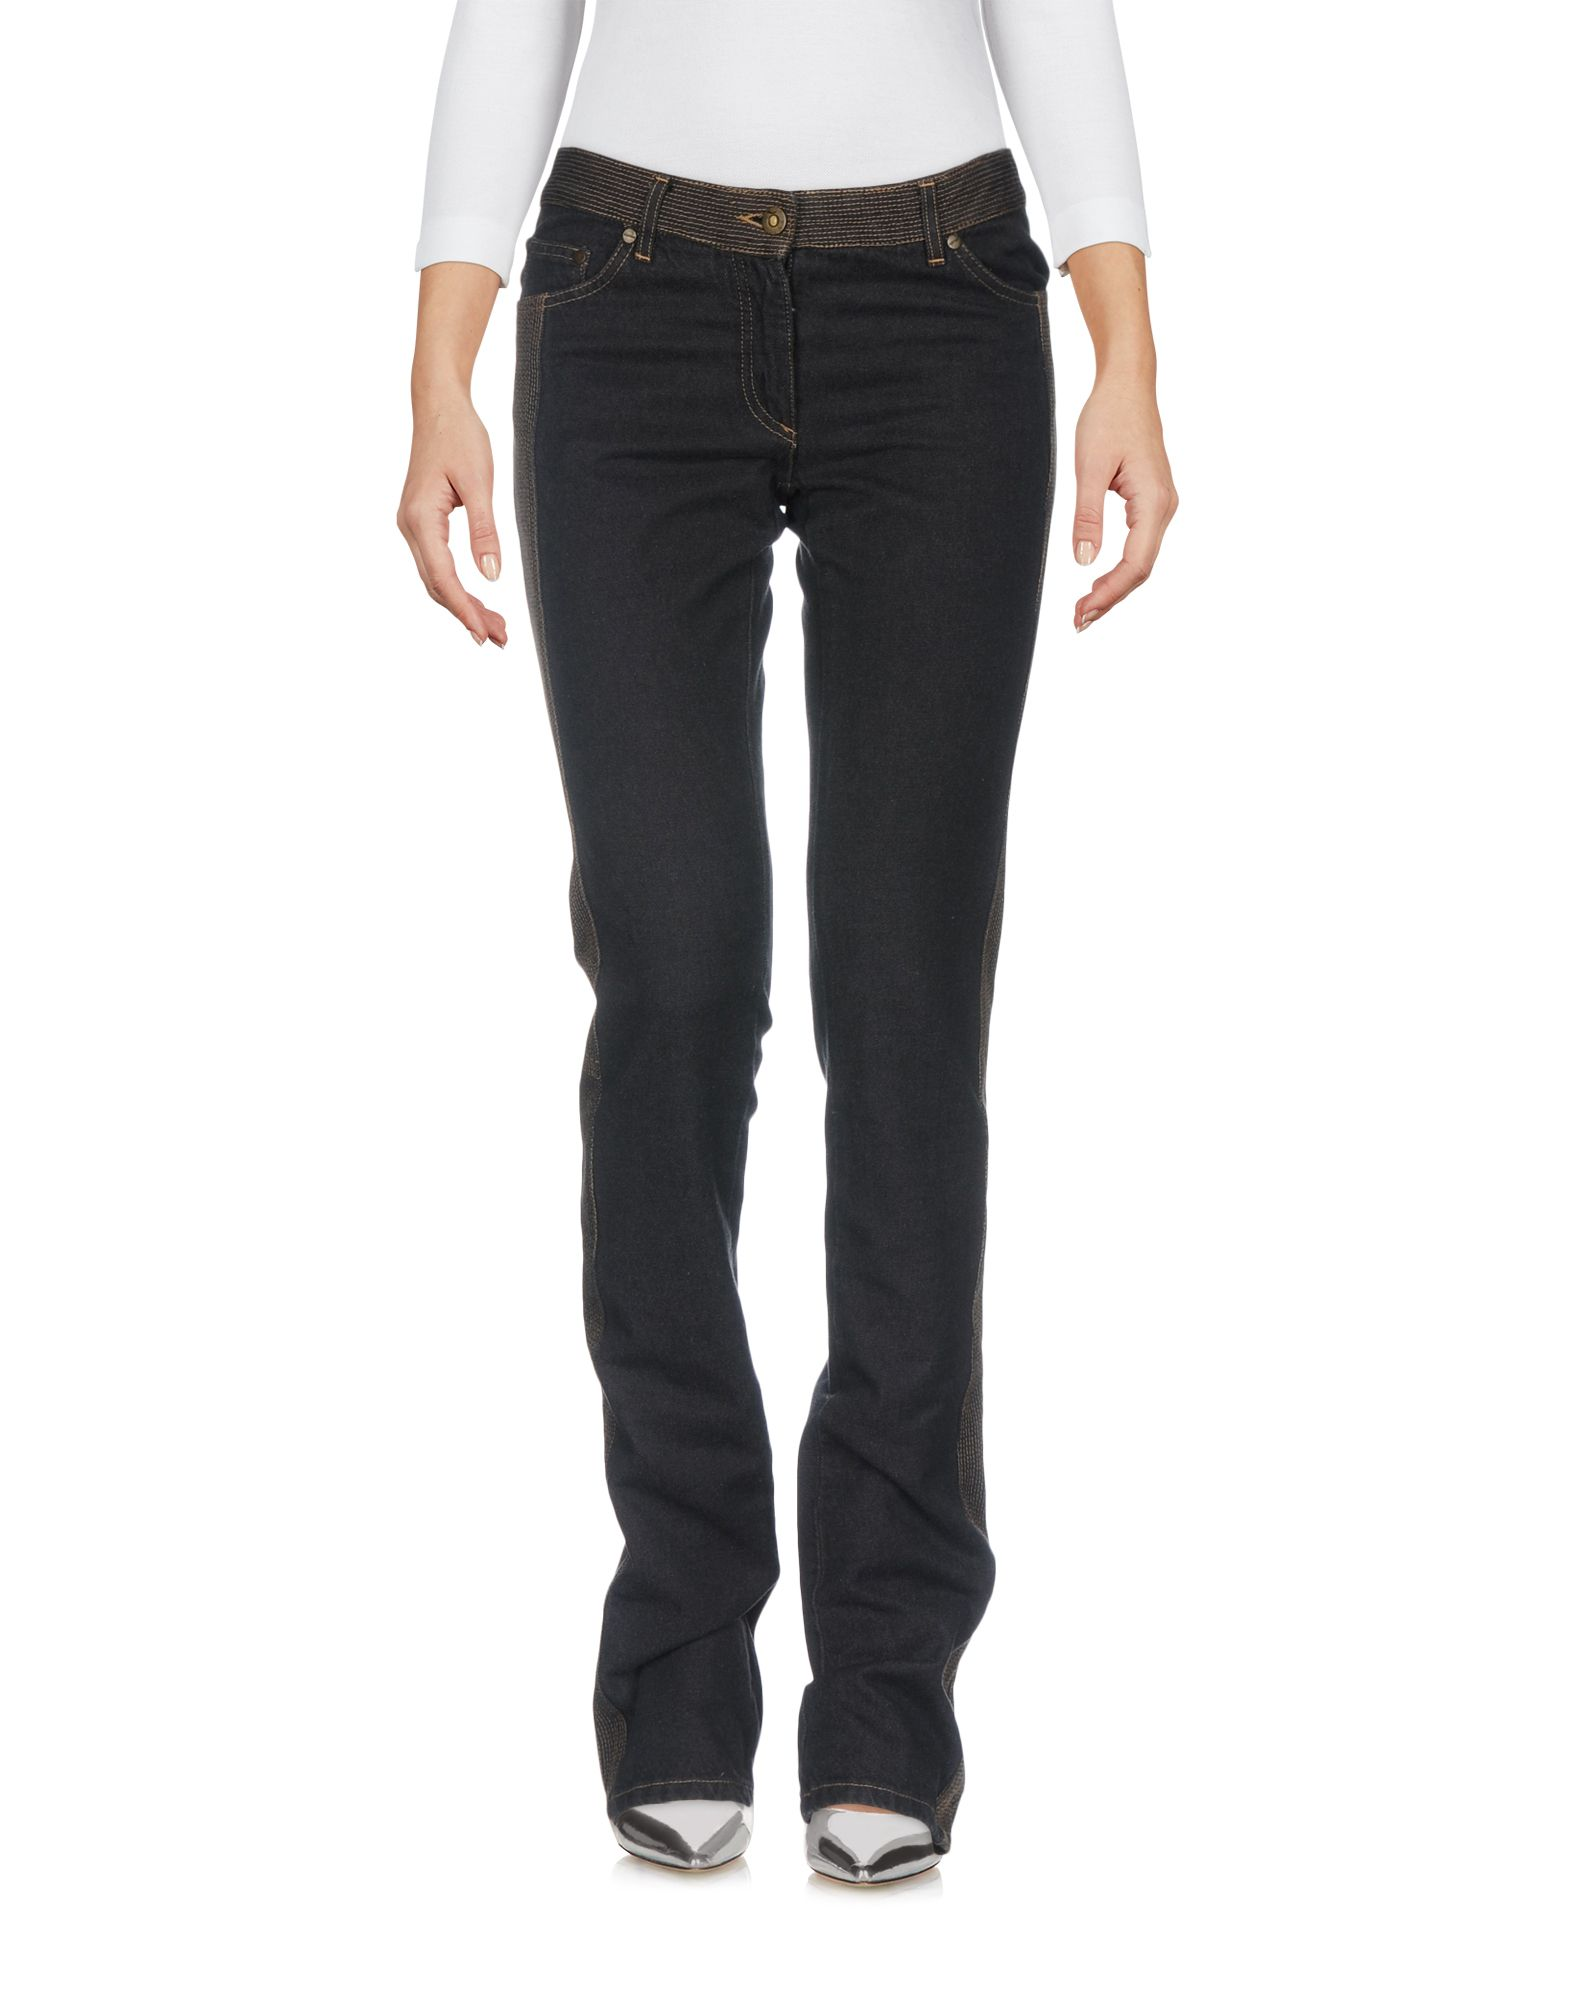 Pantaloni Jeans Alexander Mcqueen Donna - Acquista online su CMeRb9k2SJ